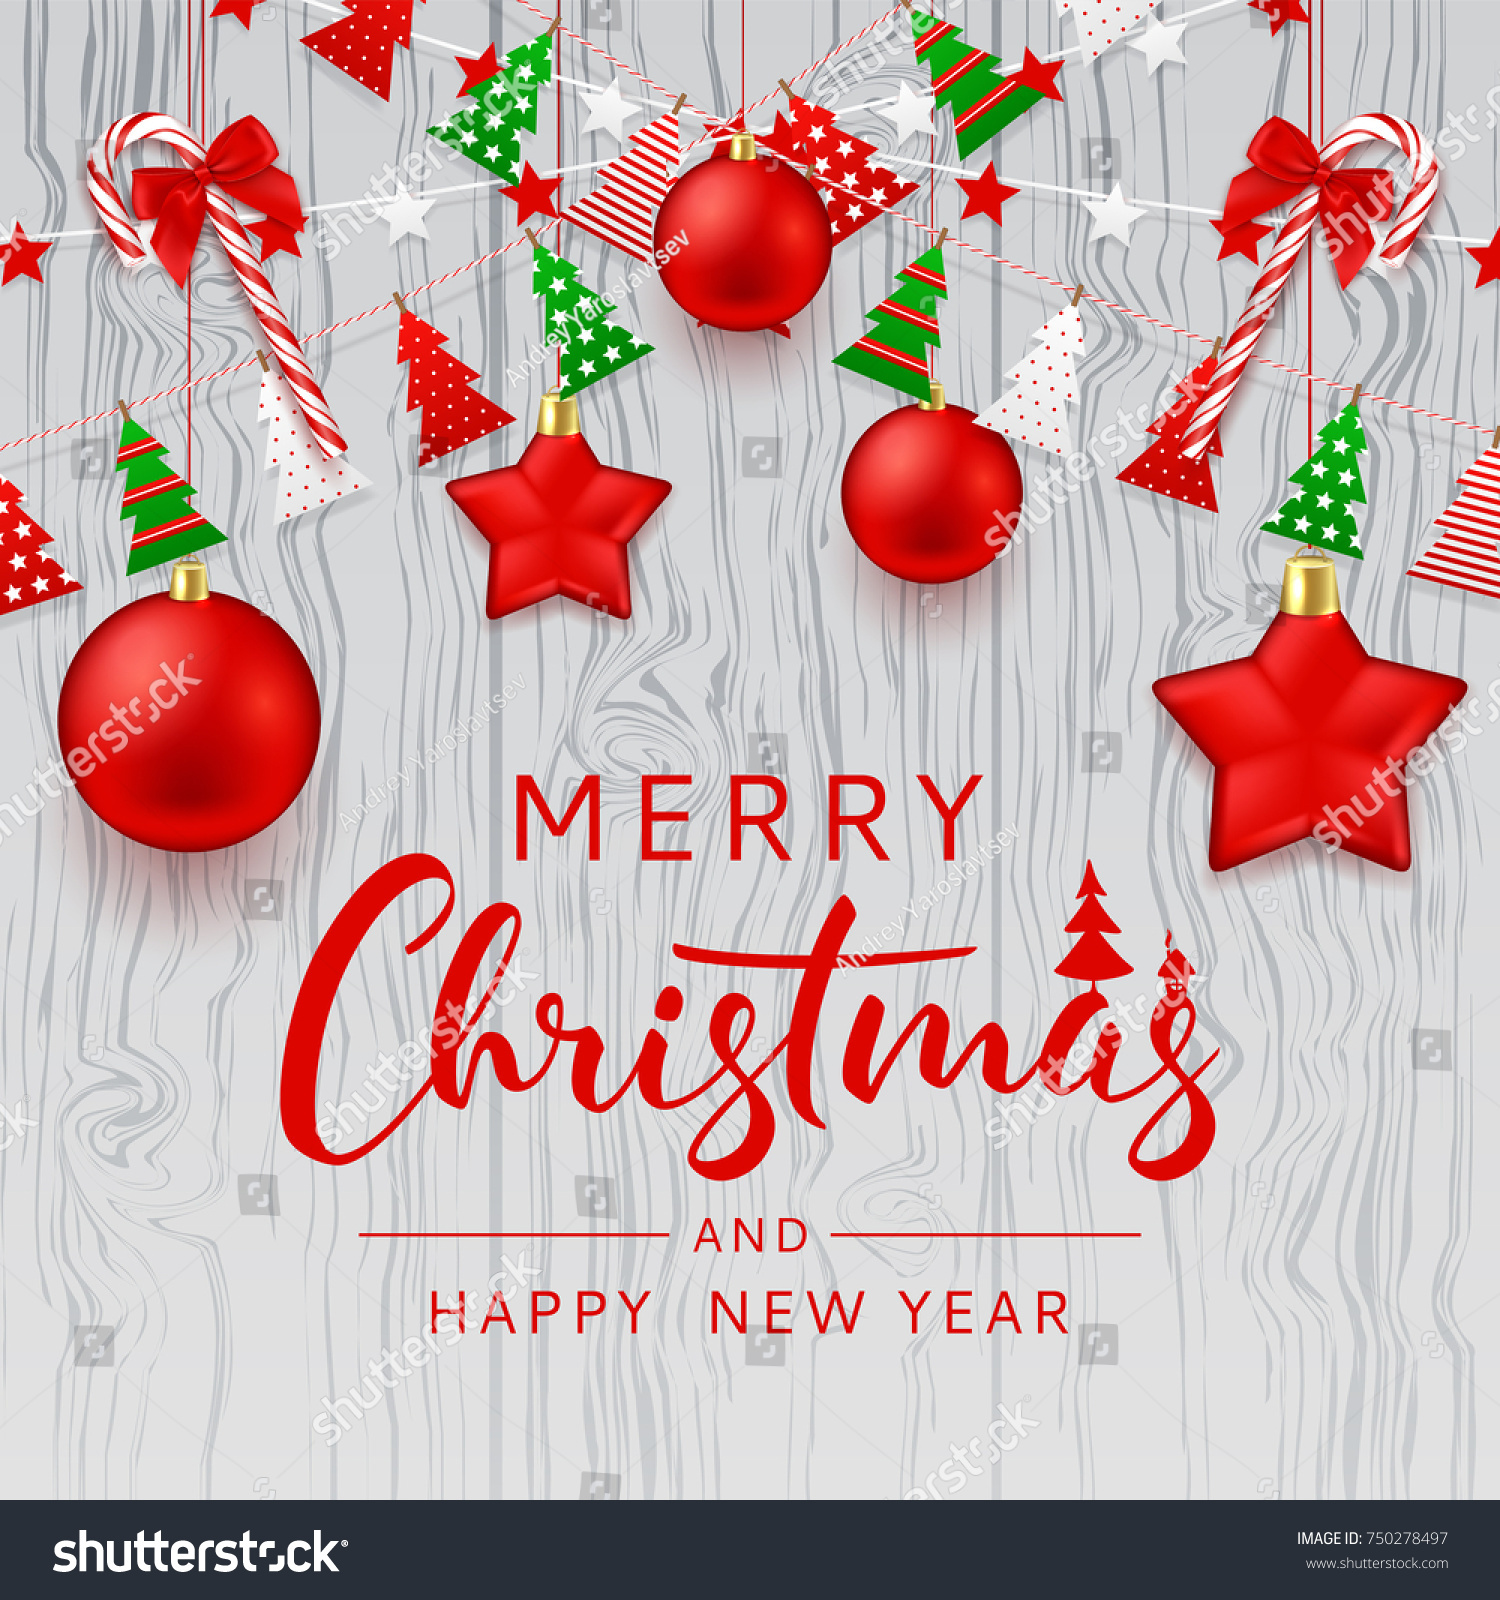 Merry Christmas Beautiful Card Festive Decoration Stock Vector ...